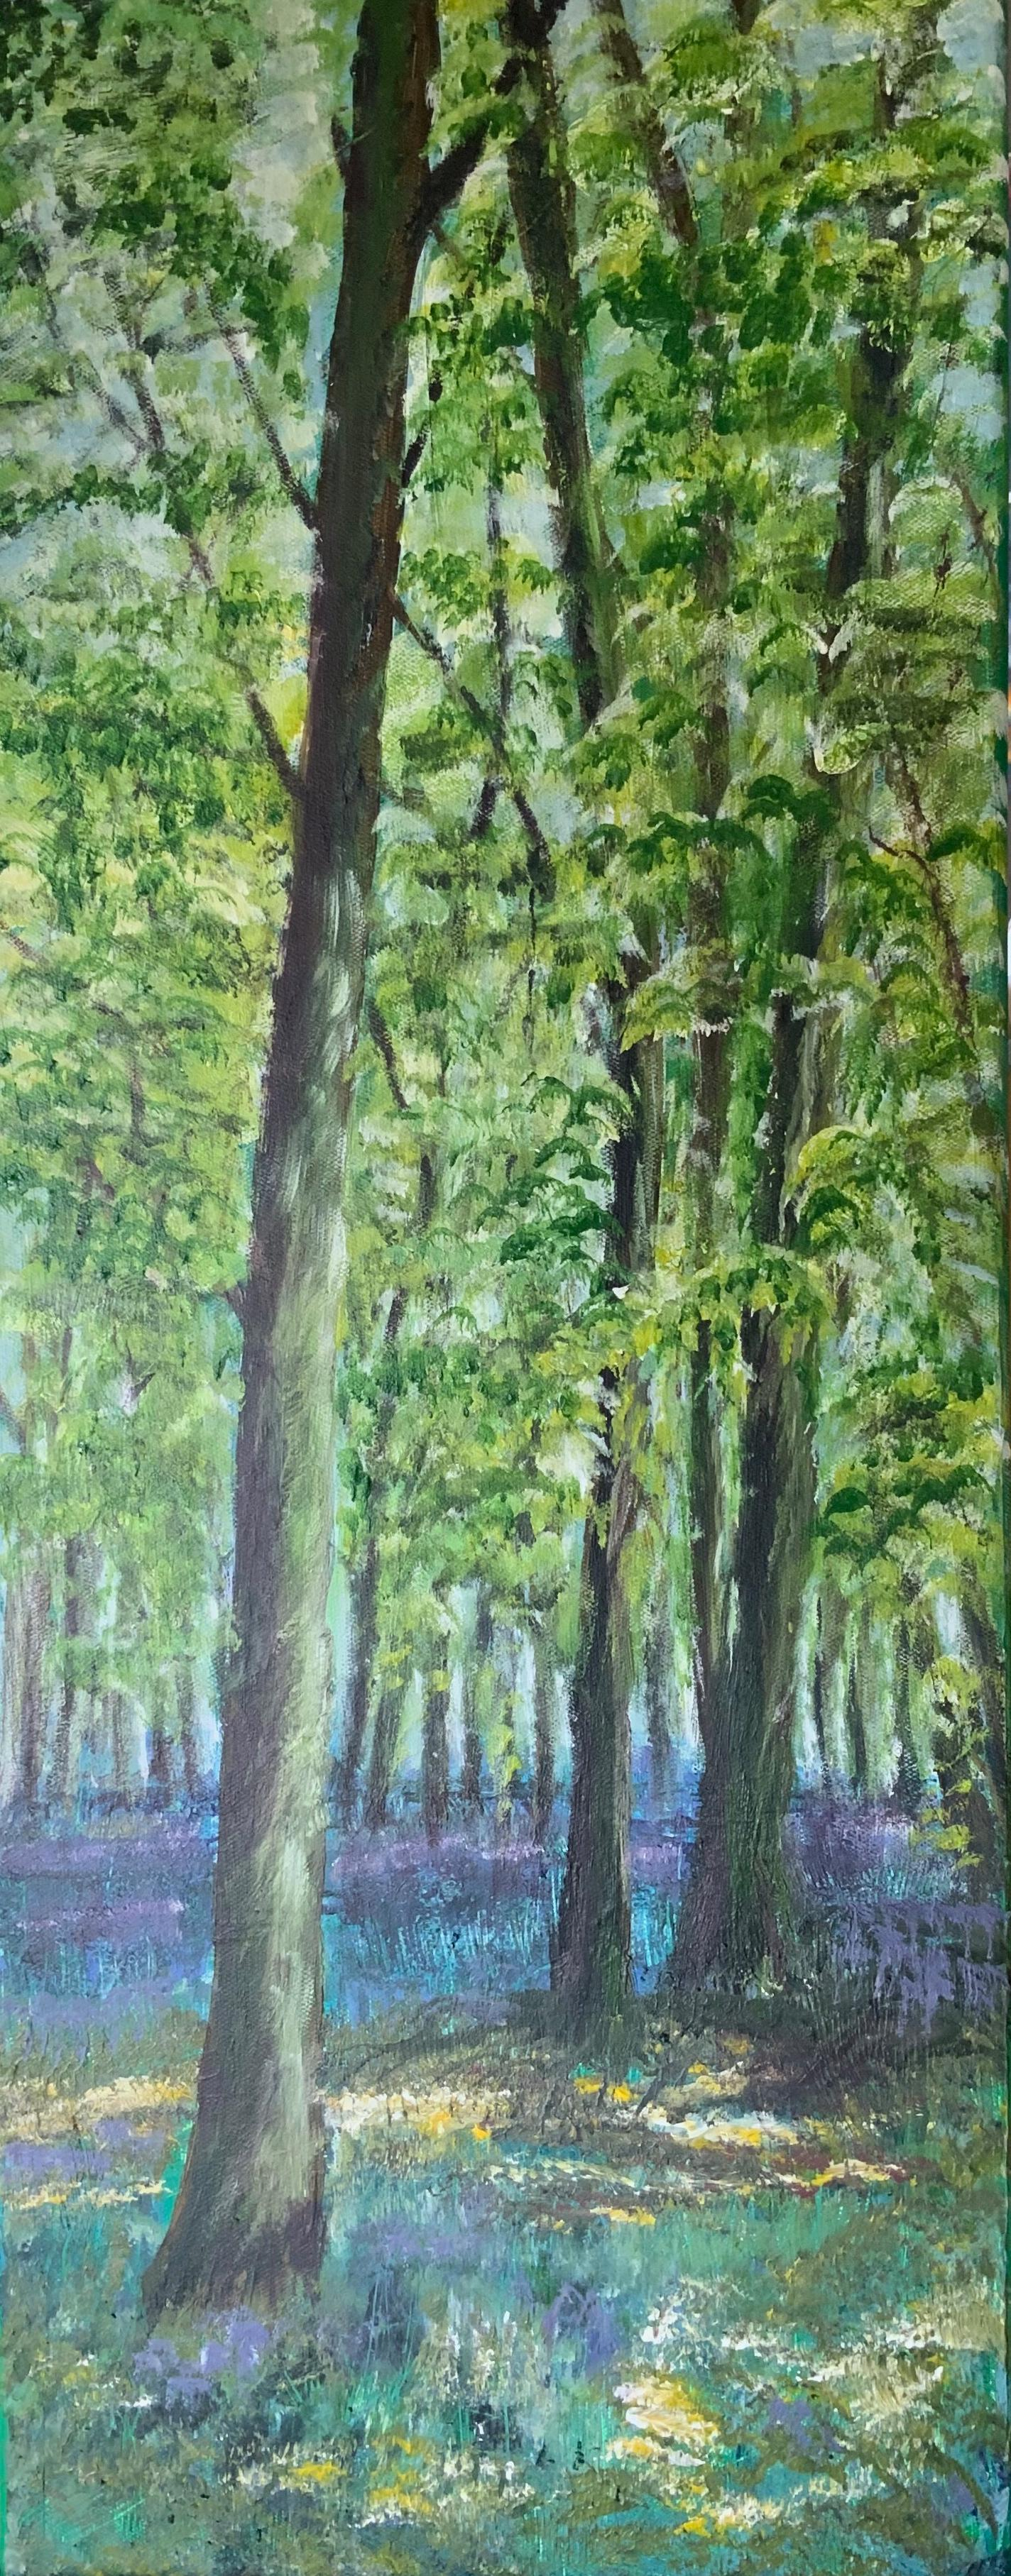 Print 14 - Spring Trees - Size: 140 x 357